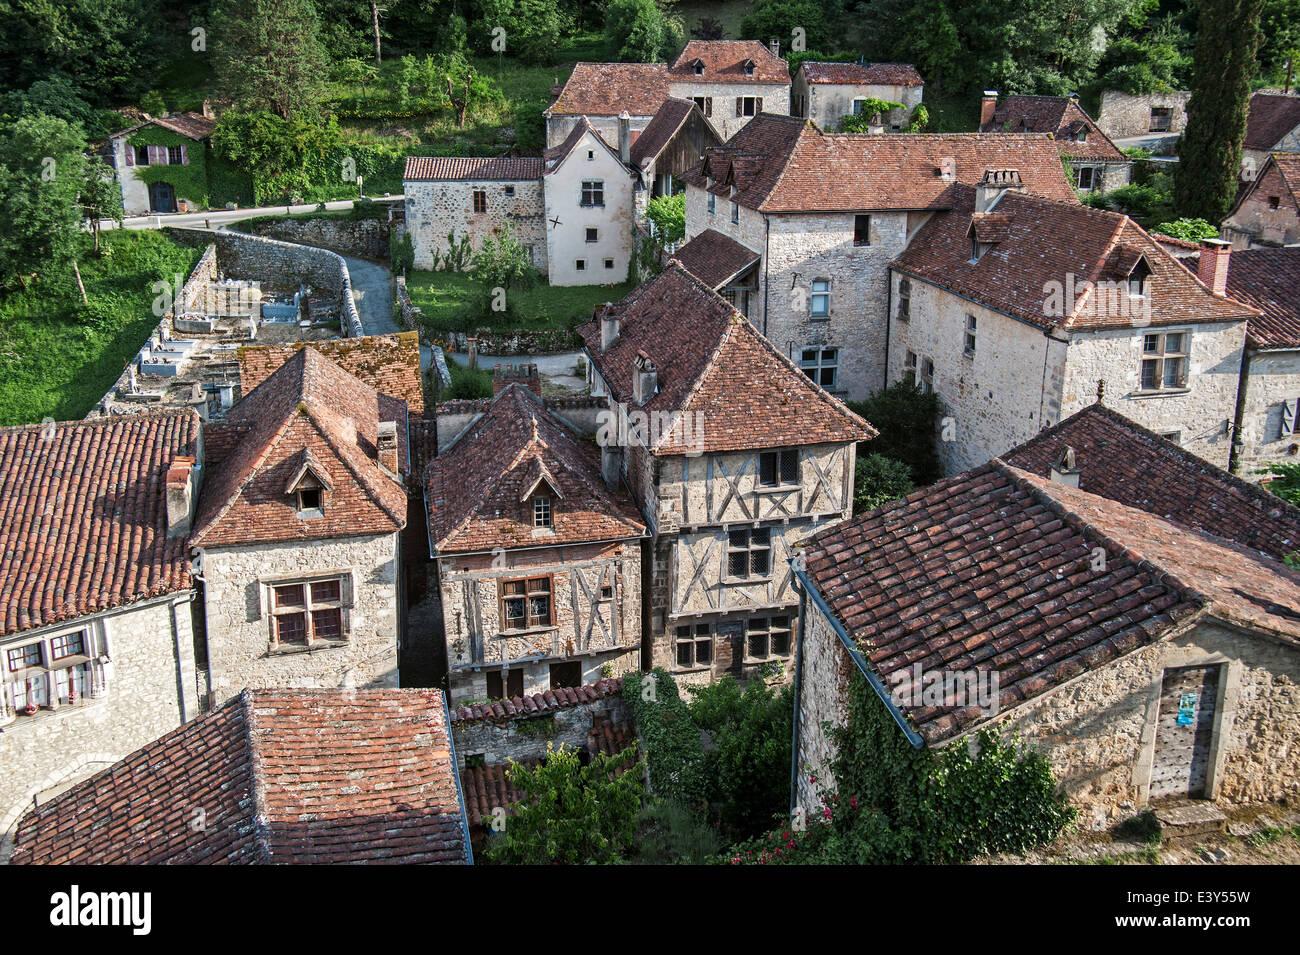 Half-timbered houses at the medieval village Saint-Cirq-Lapopie, Lot, Midi-Pyrénées, France - Stock Image